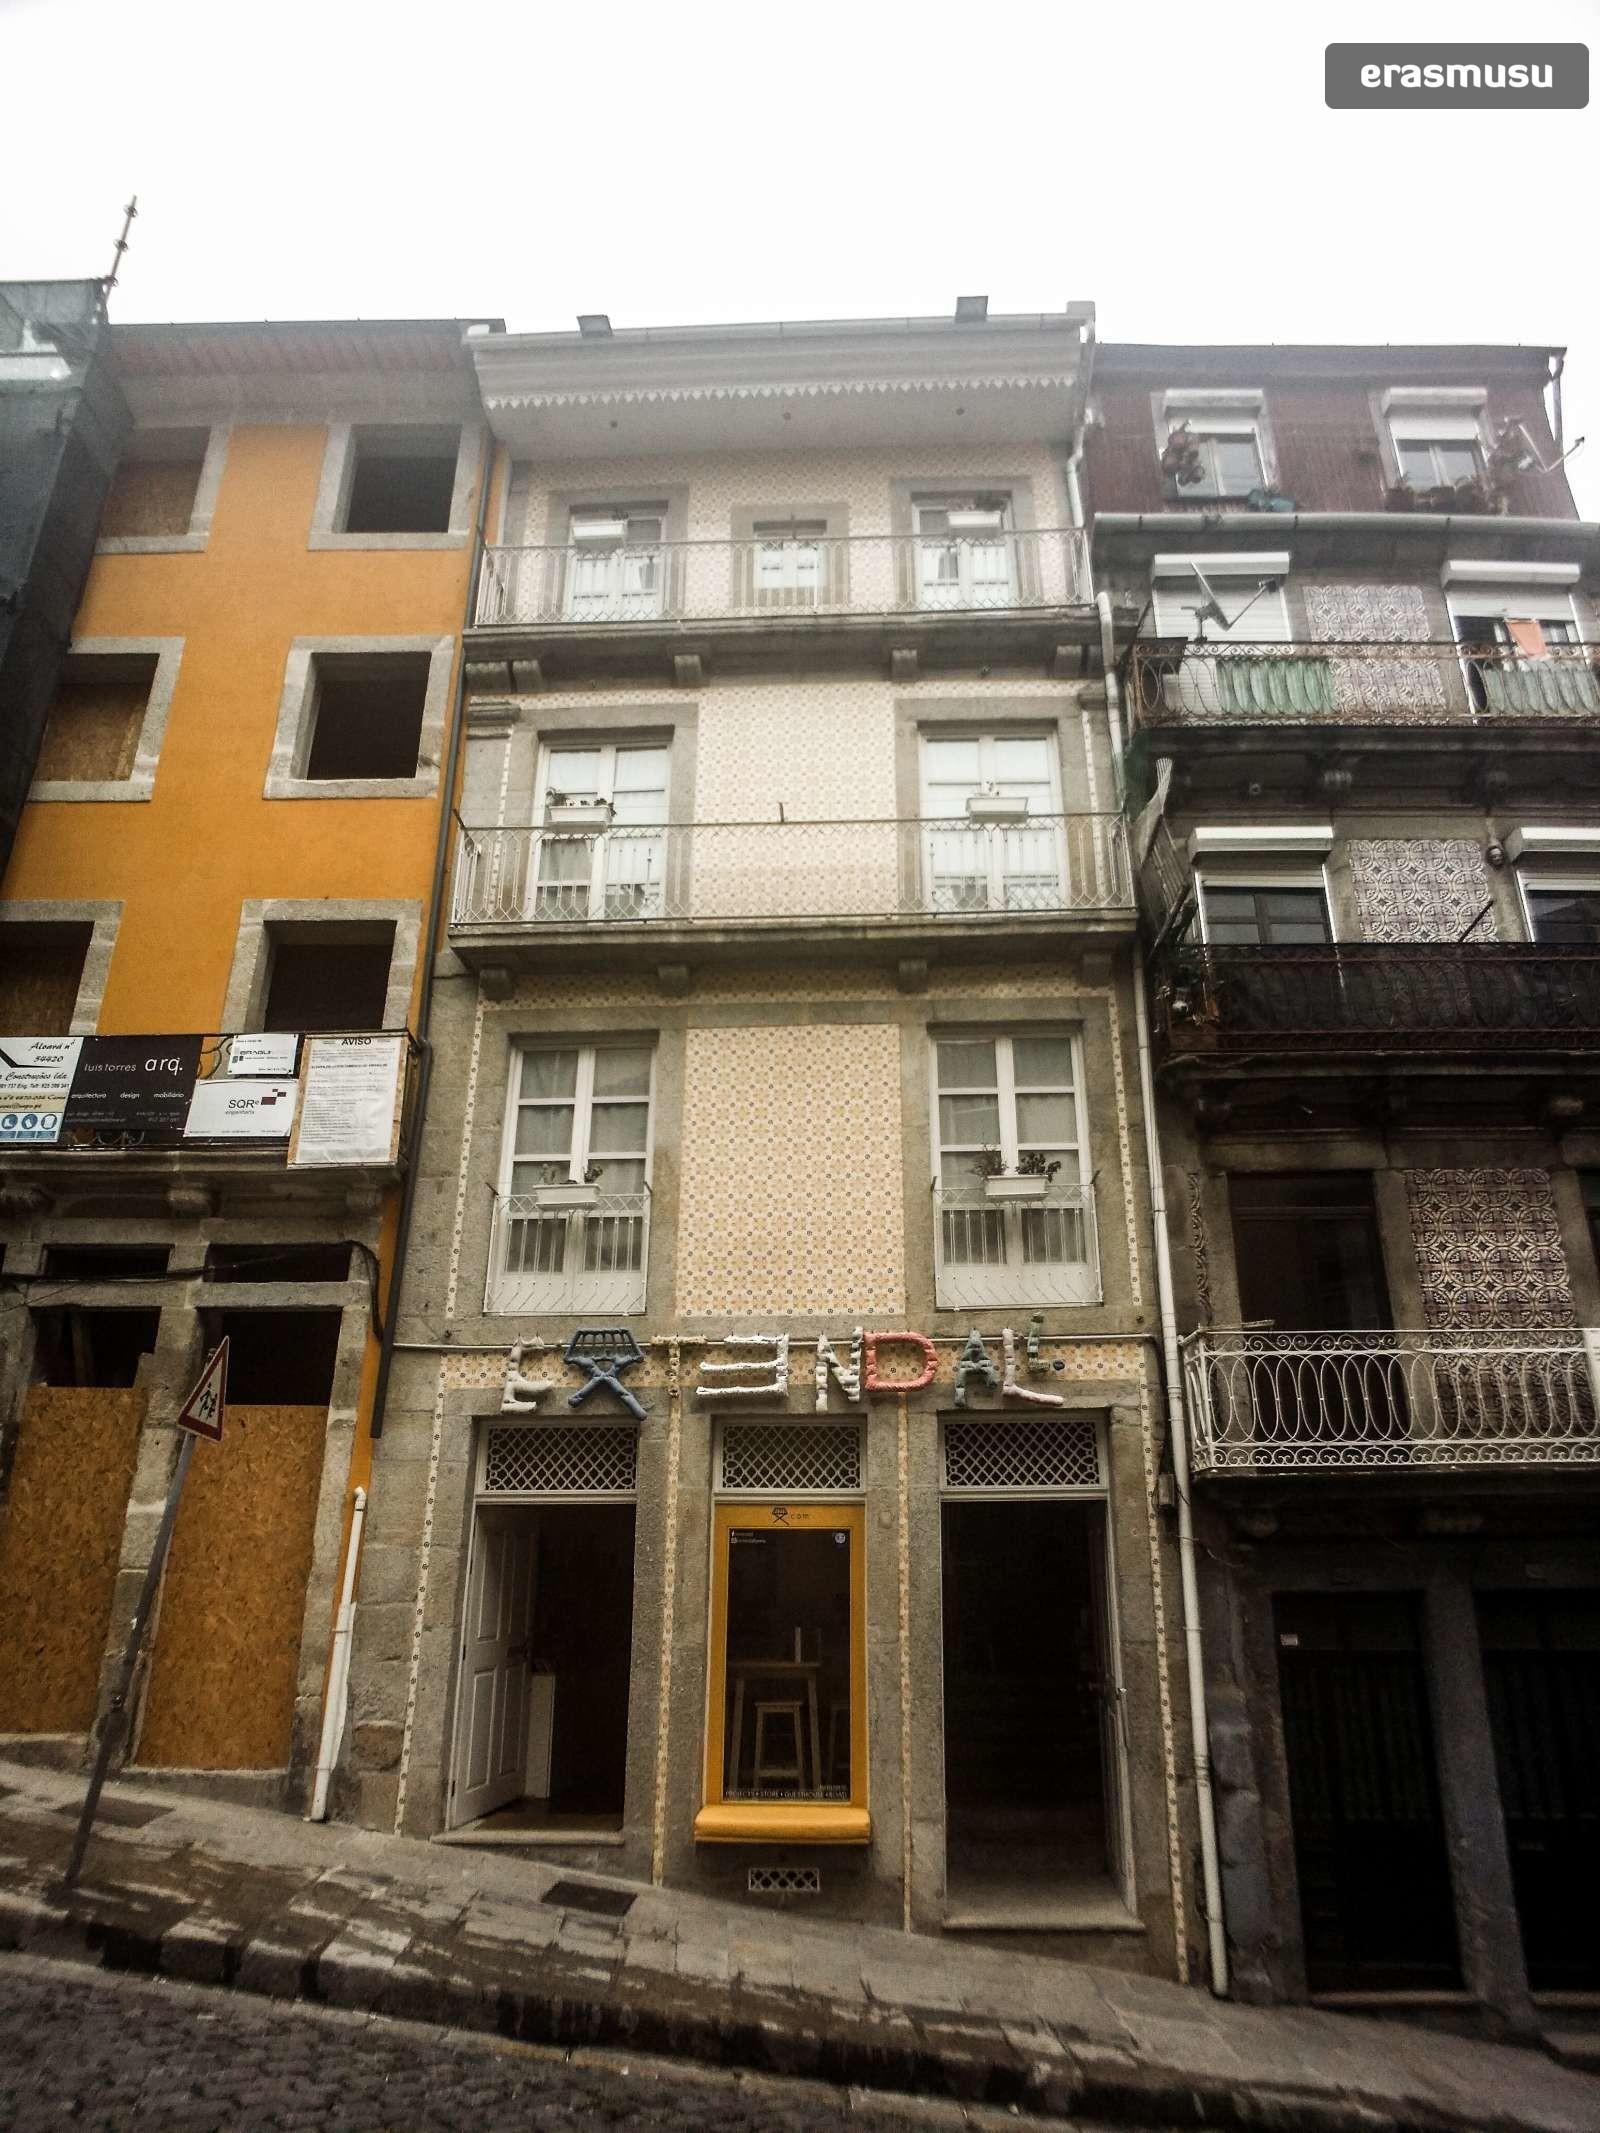 furnished-studio-apartment-rent-sao-nicolau-efb6e6b3e63d15906ba7